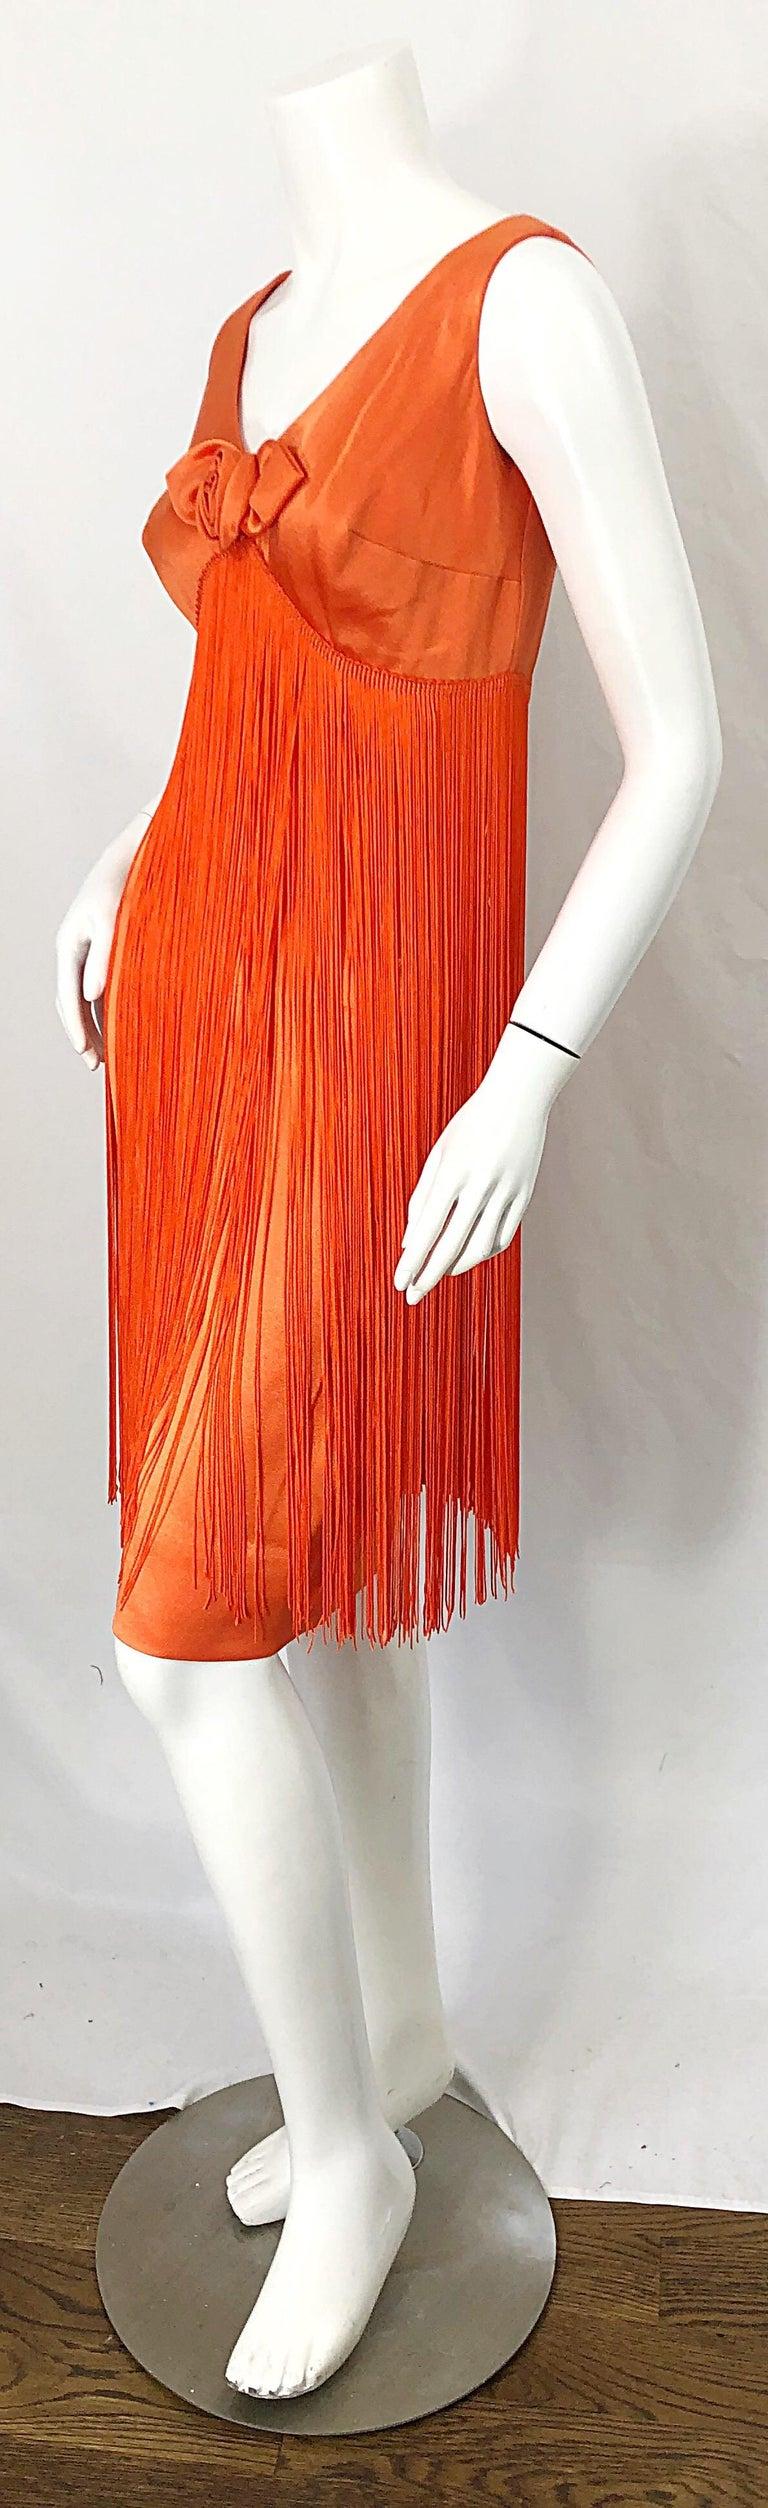 1960s Joseph Magnin Neon Orange Fully Fringed Vintage 60s Flapper Dress For Sale 4